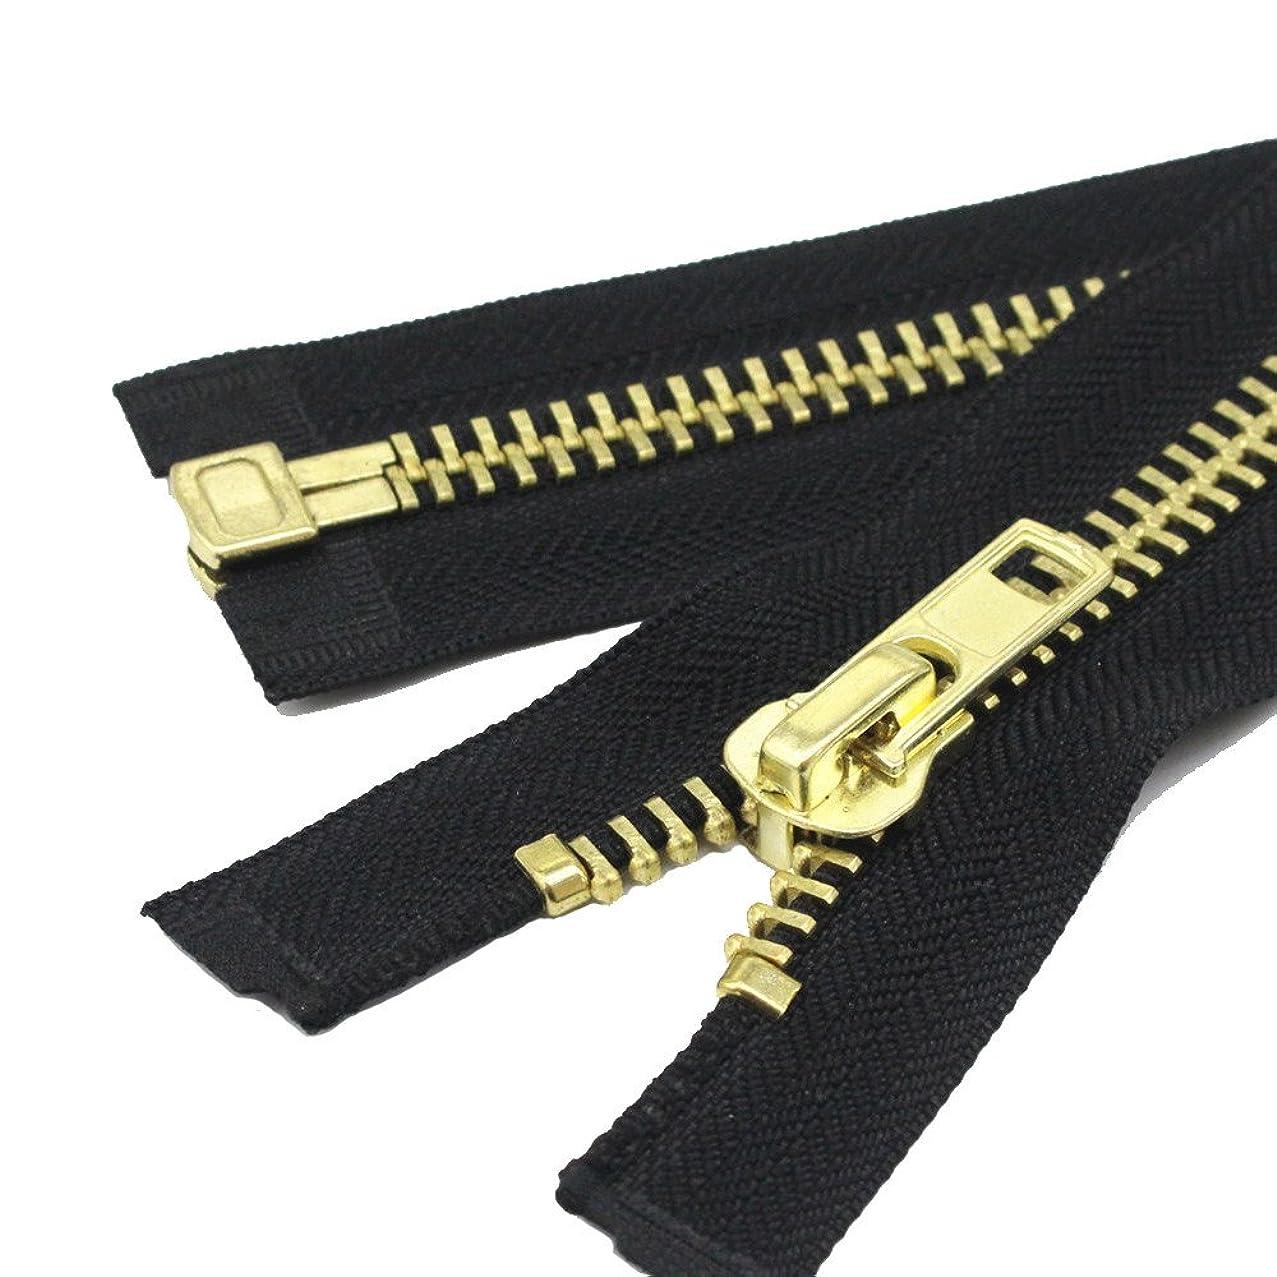 YaHoGa #10 29 Inch Brass Separating Jacket Zipper Y-Teeth Metal Zipper Heavy Duty Metal Zippers for Jackets Sewing Coats Crafts (29